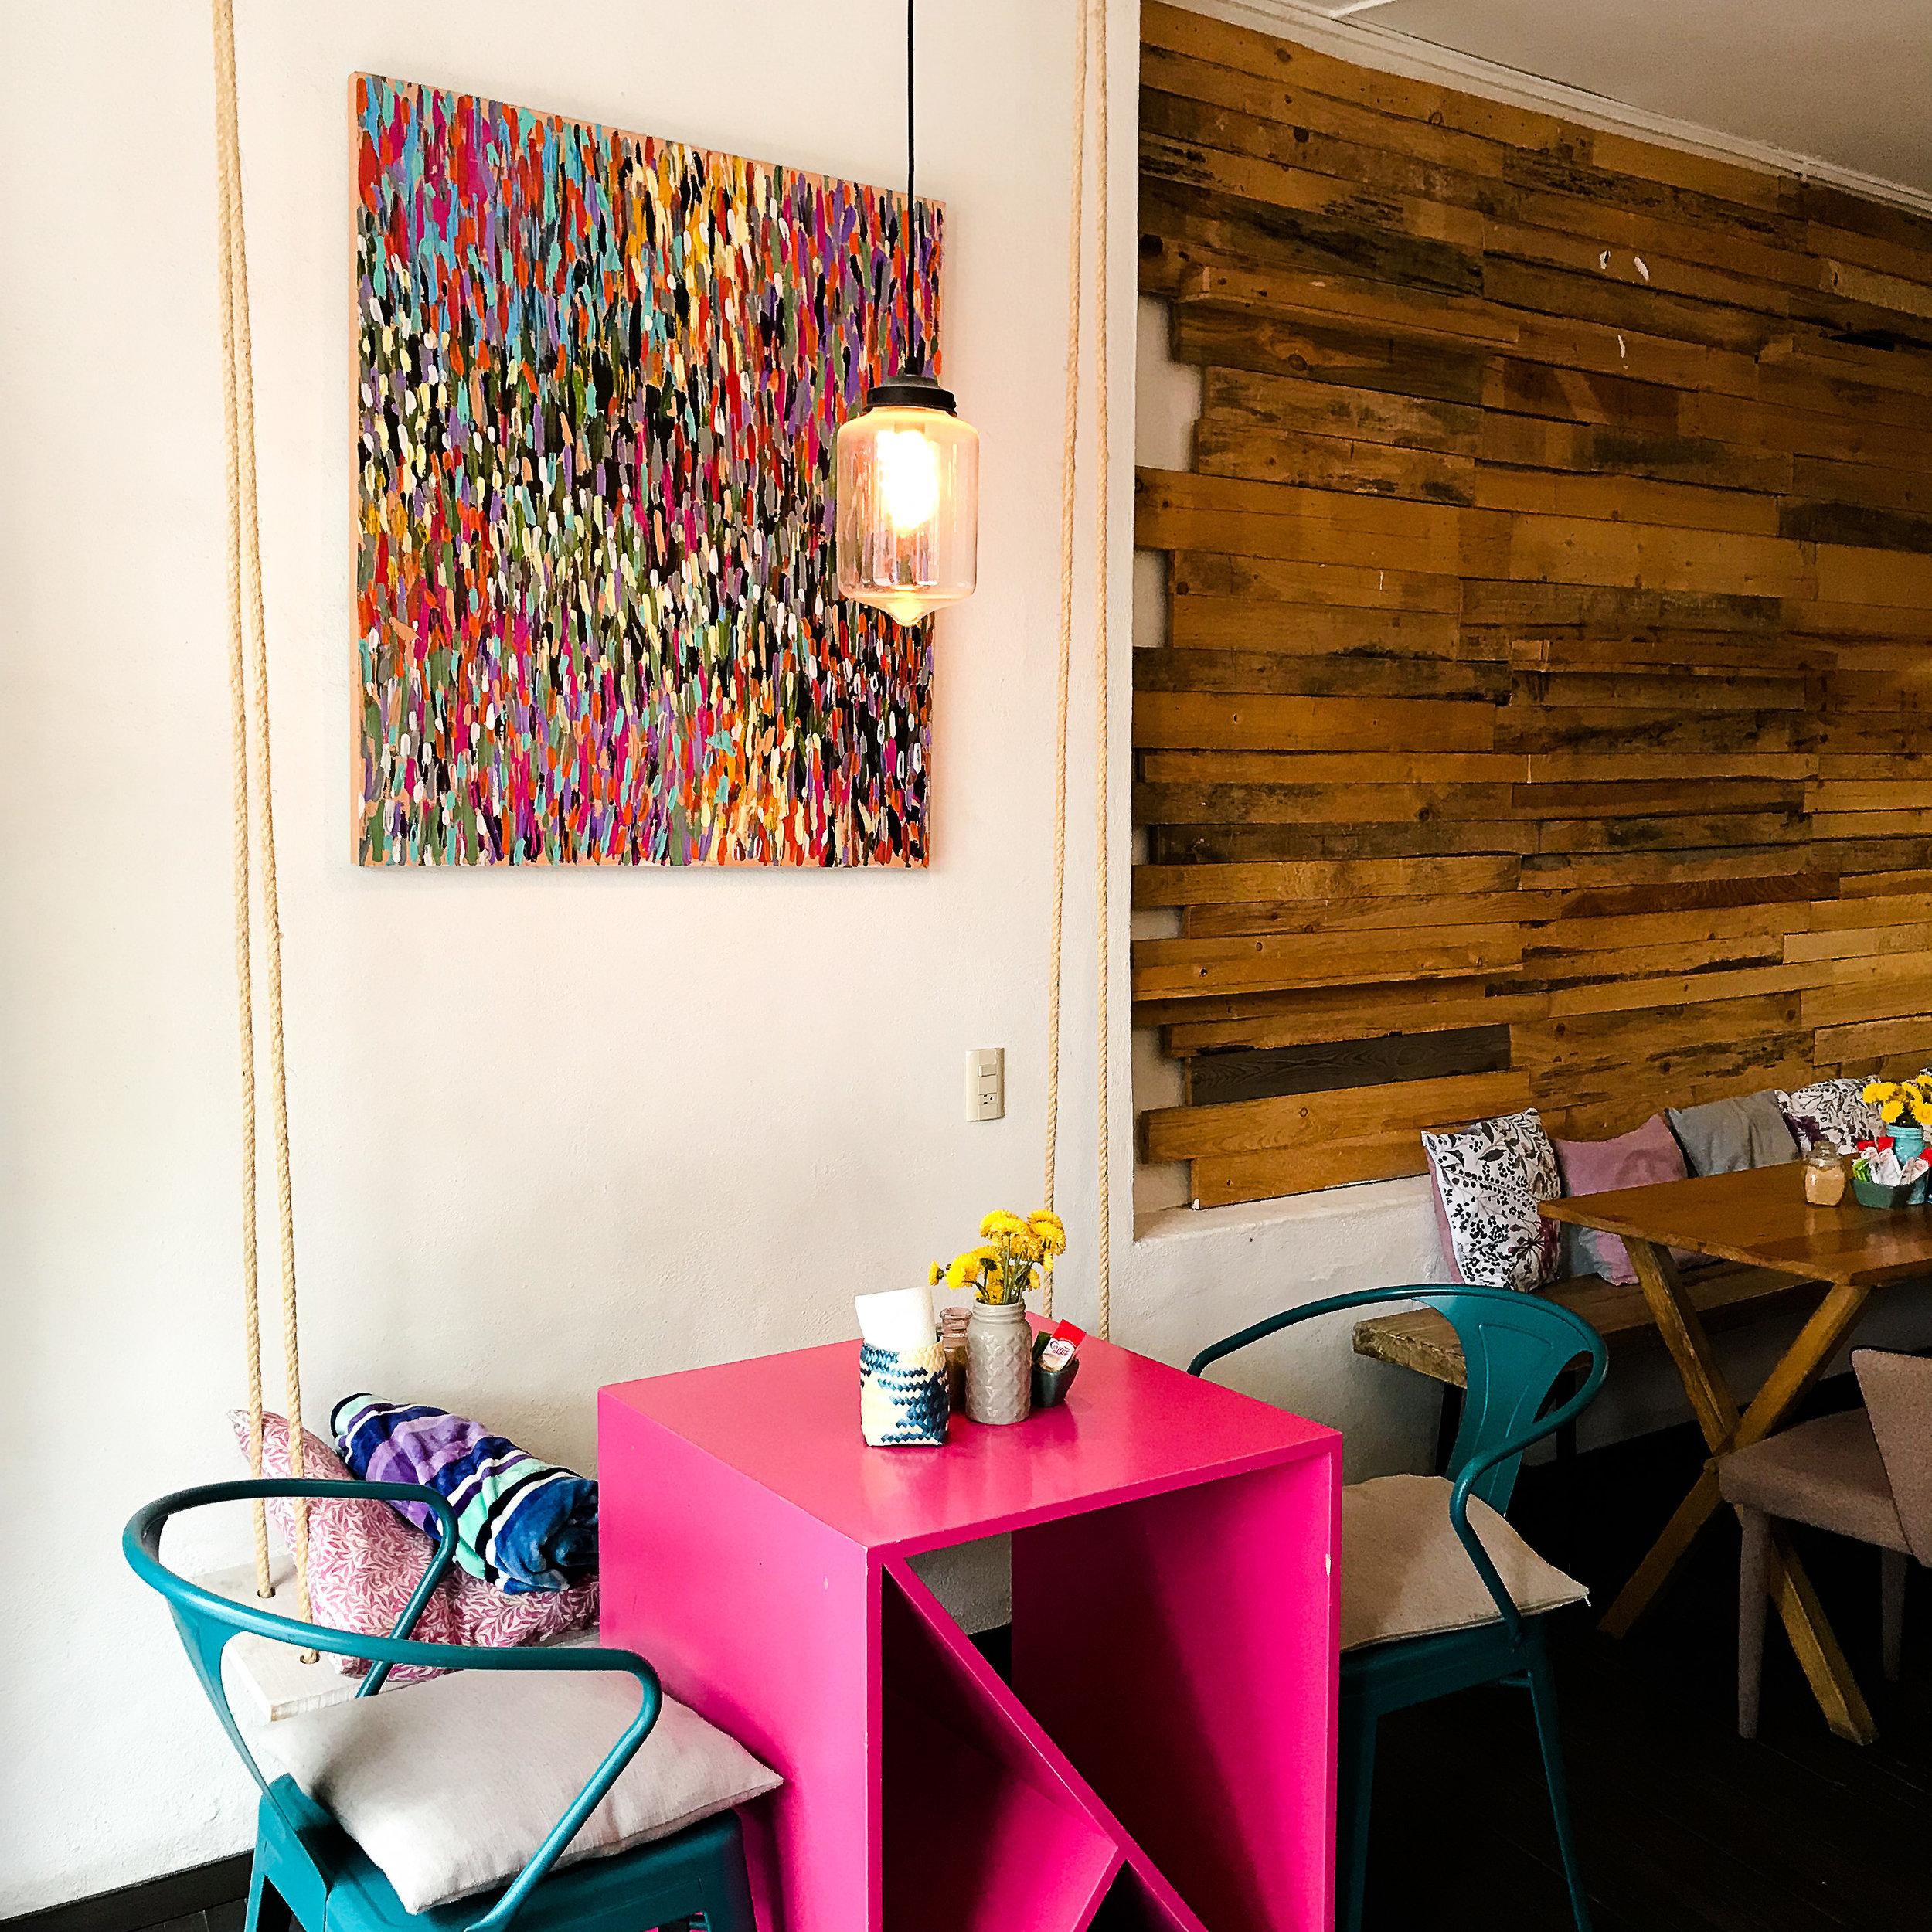 mexican-food-san-miguel-de-allende-restuarants-coffee-cafes-32.jpg